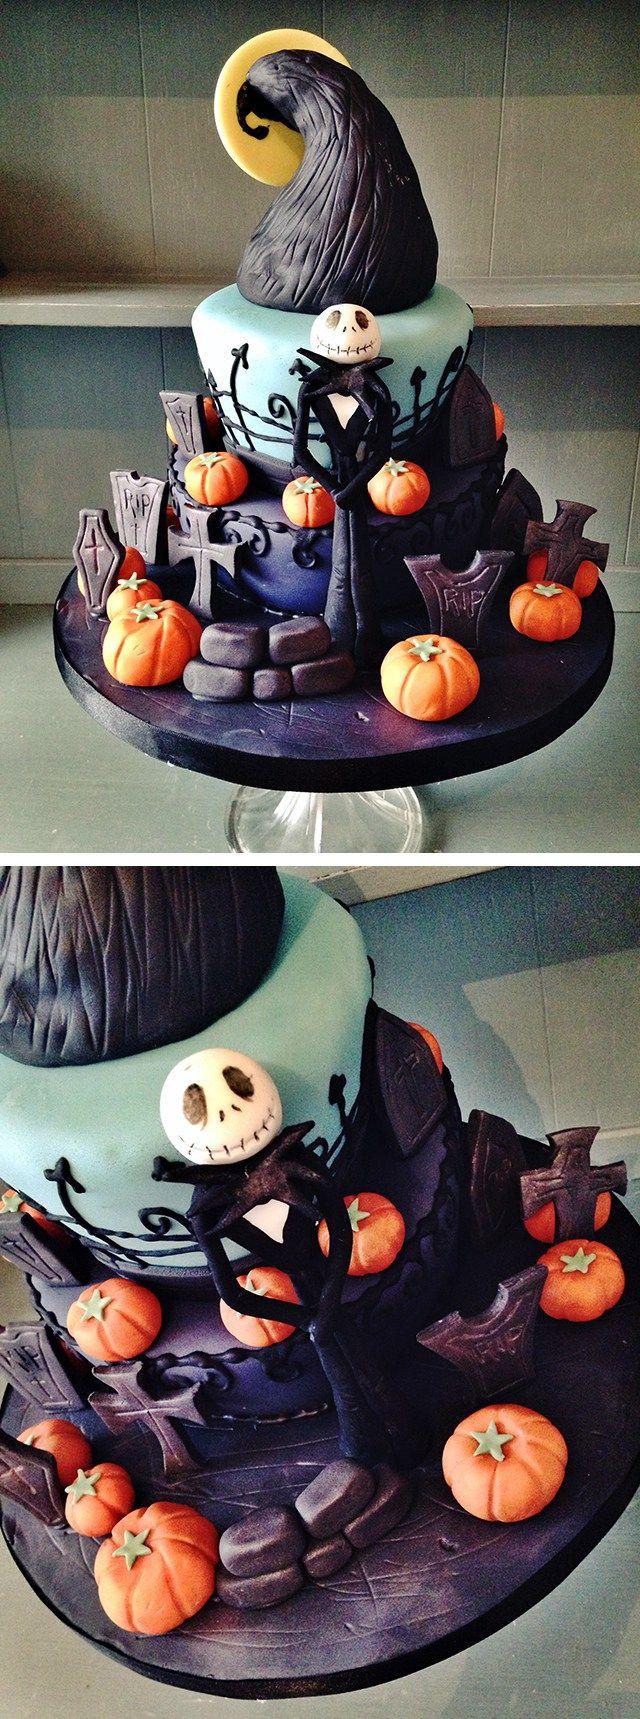 Jack Skellington Nightmare Before Christmas Halloween Cake